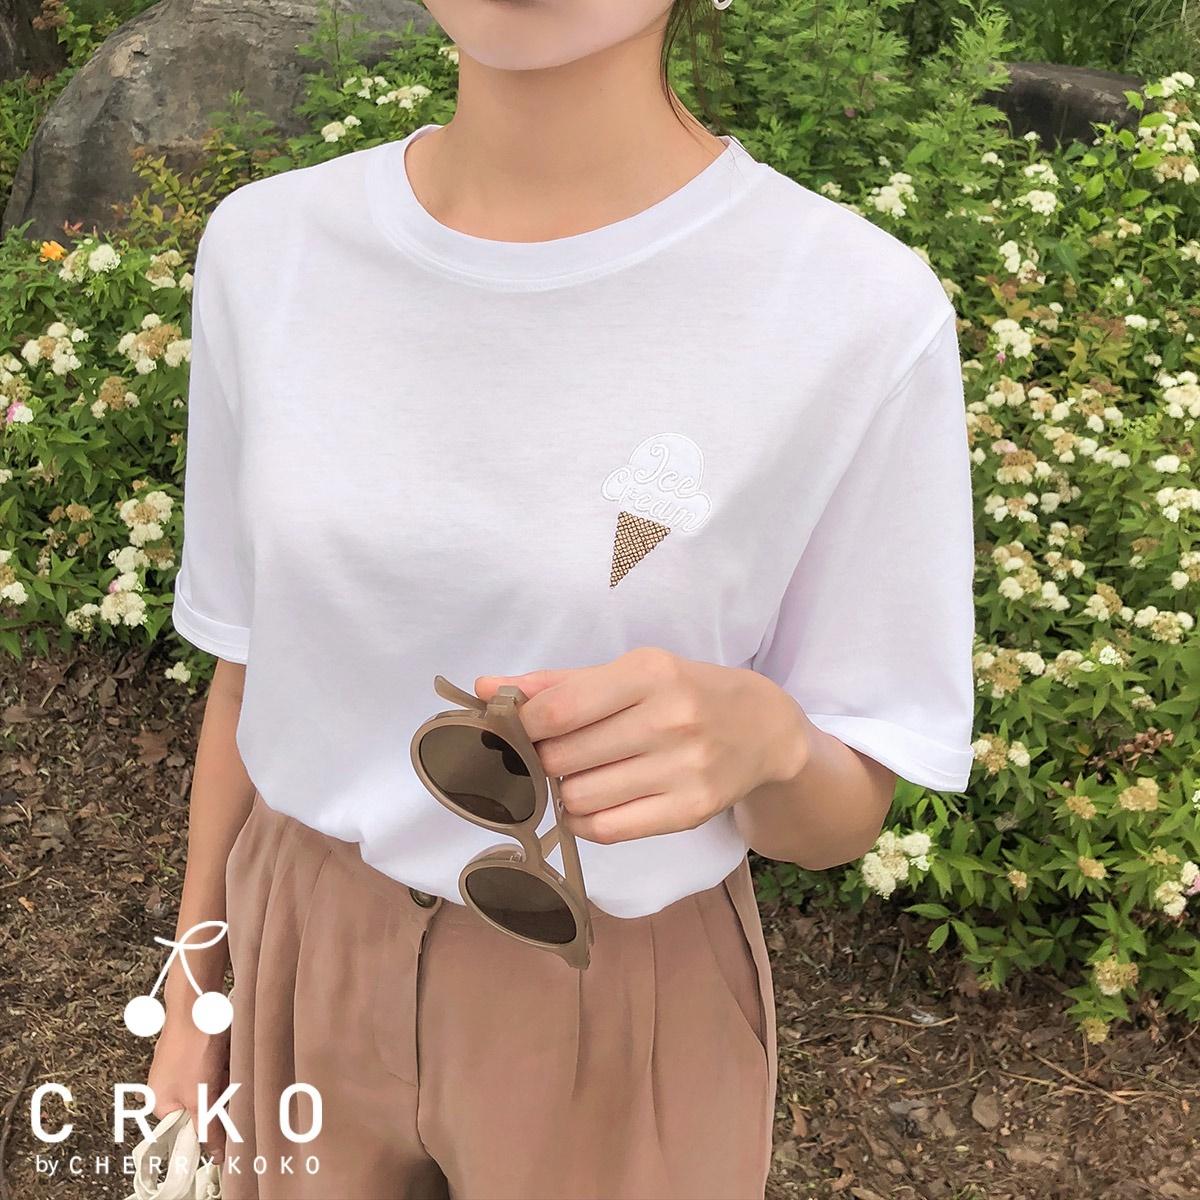 [CHERRYKOKO官方旗艦店] 冰淇淋T恤 / ice pop tee